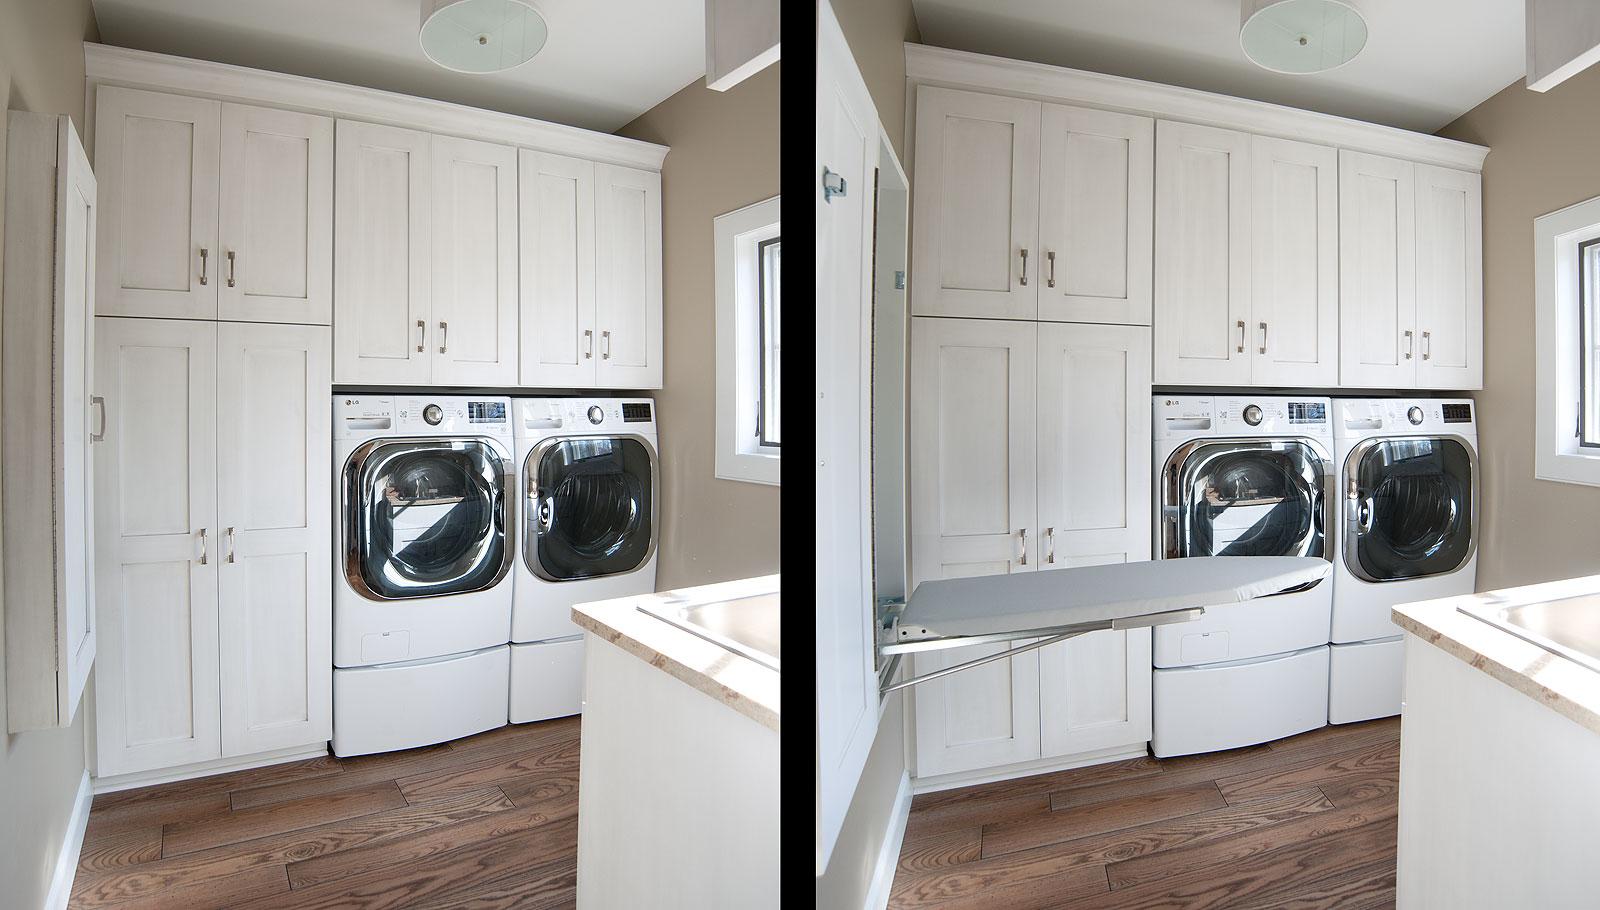 Mullet Cabinet BuiltIn Washer Dryer